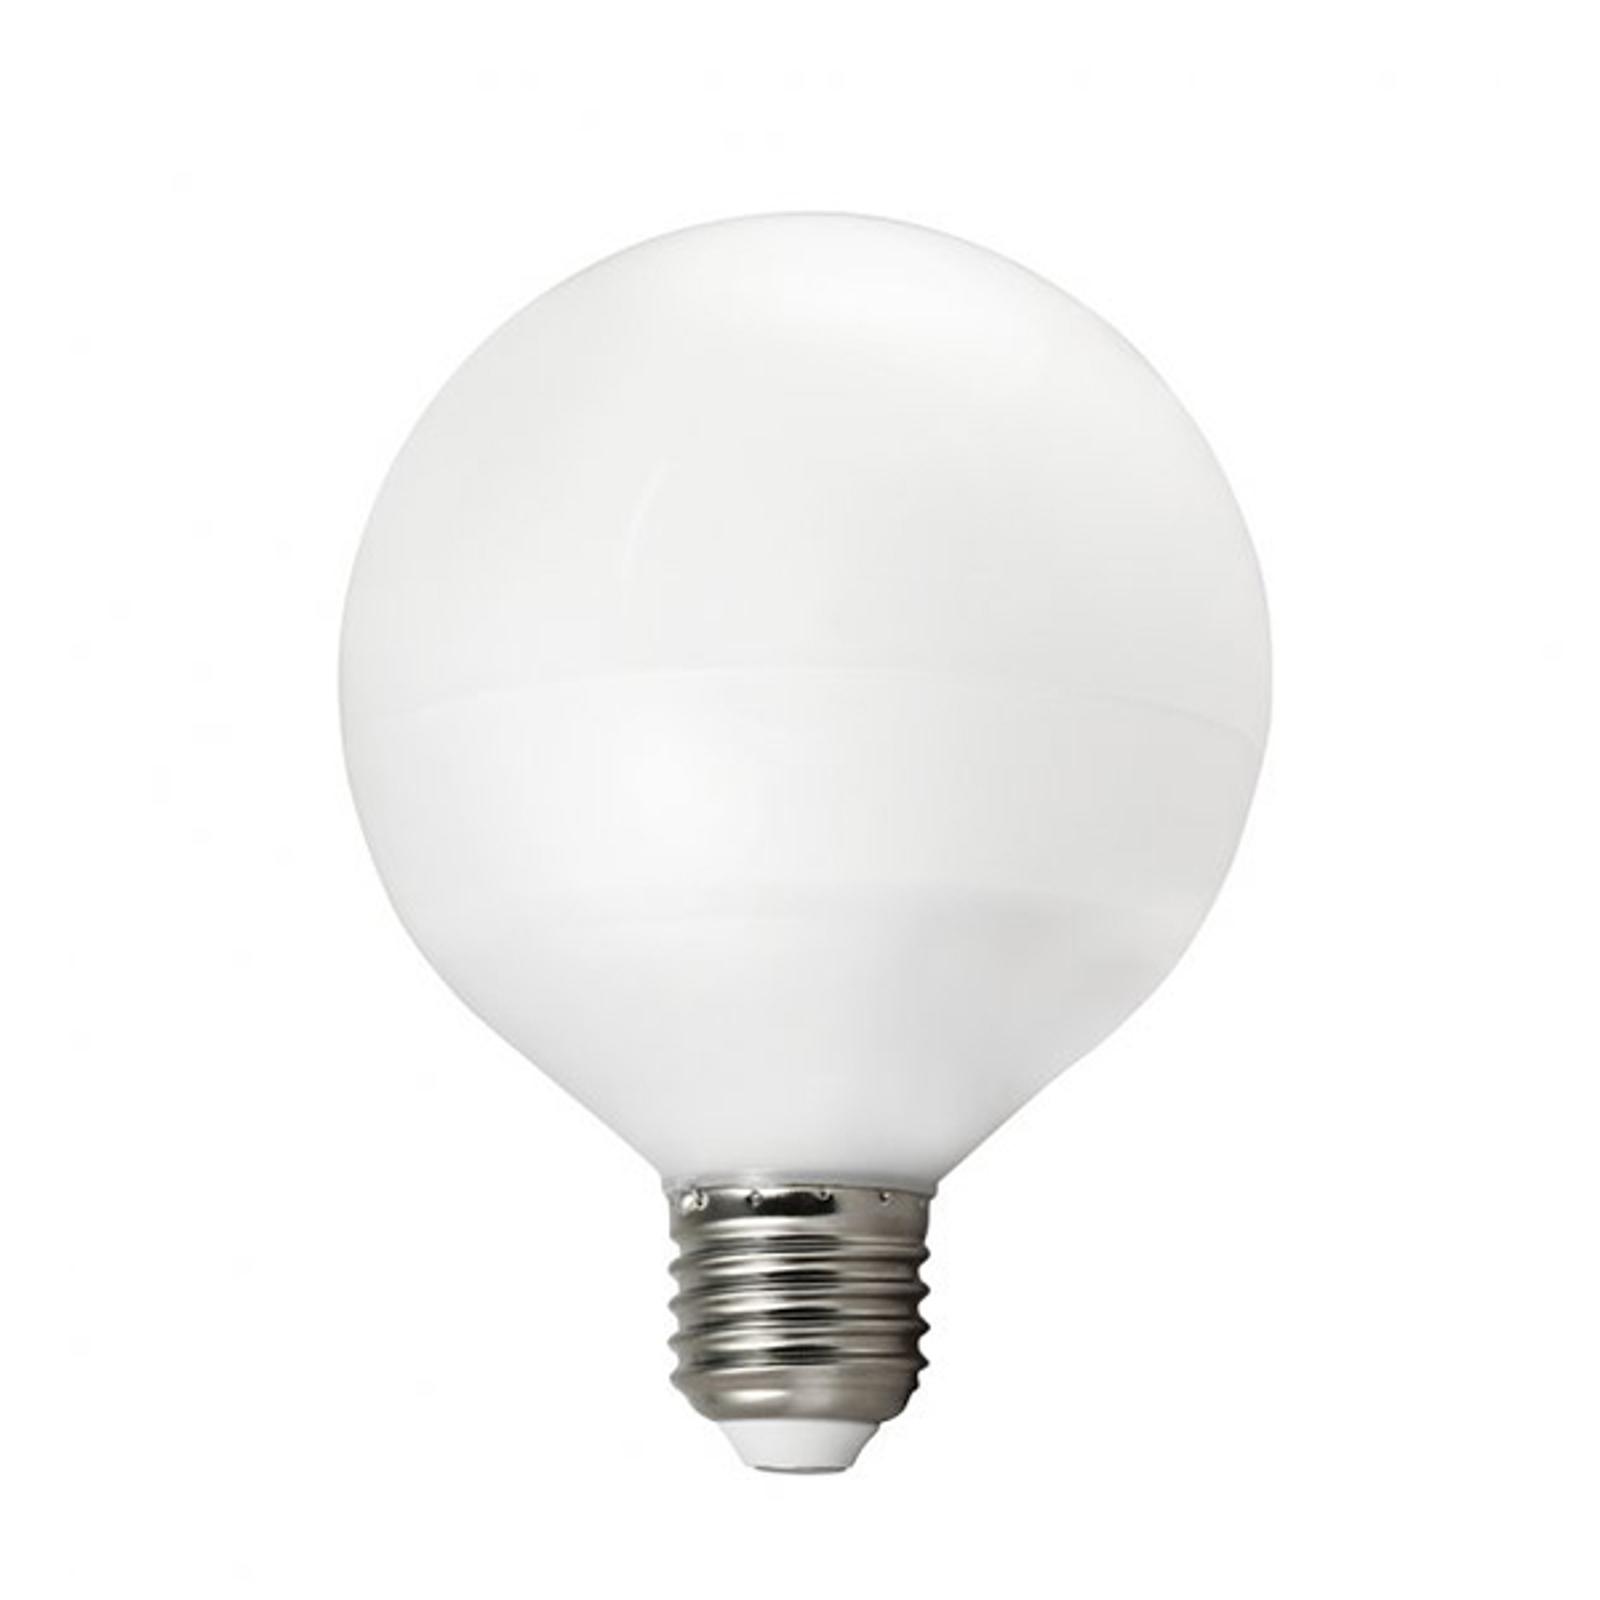 E27 13W 827 kulista żarówka LED G95, ciepła biel